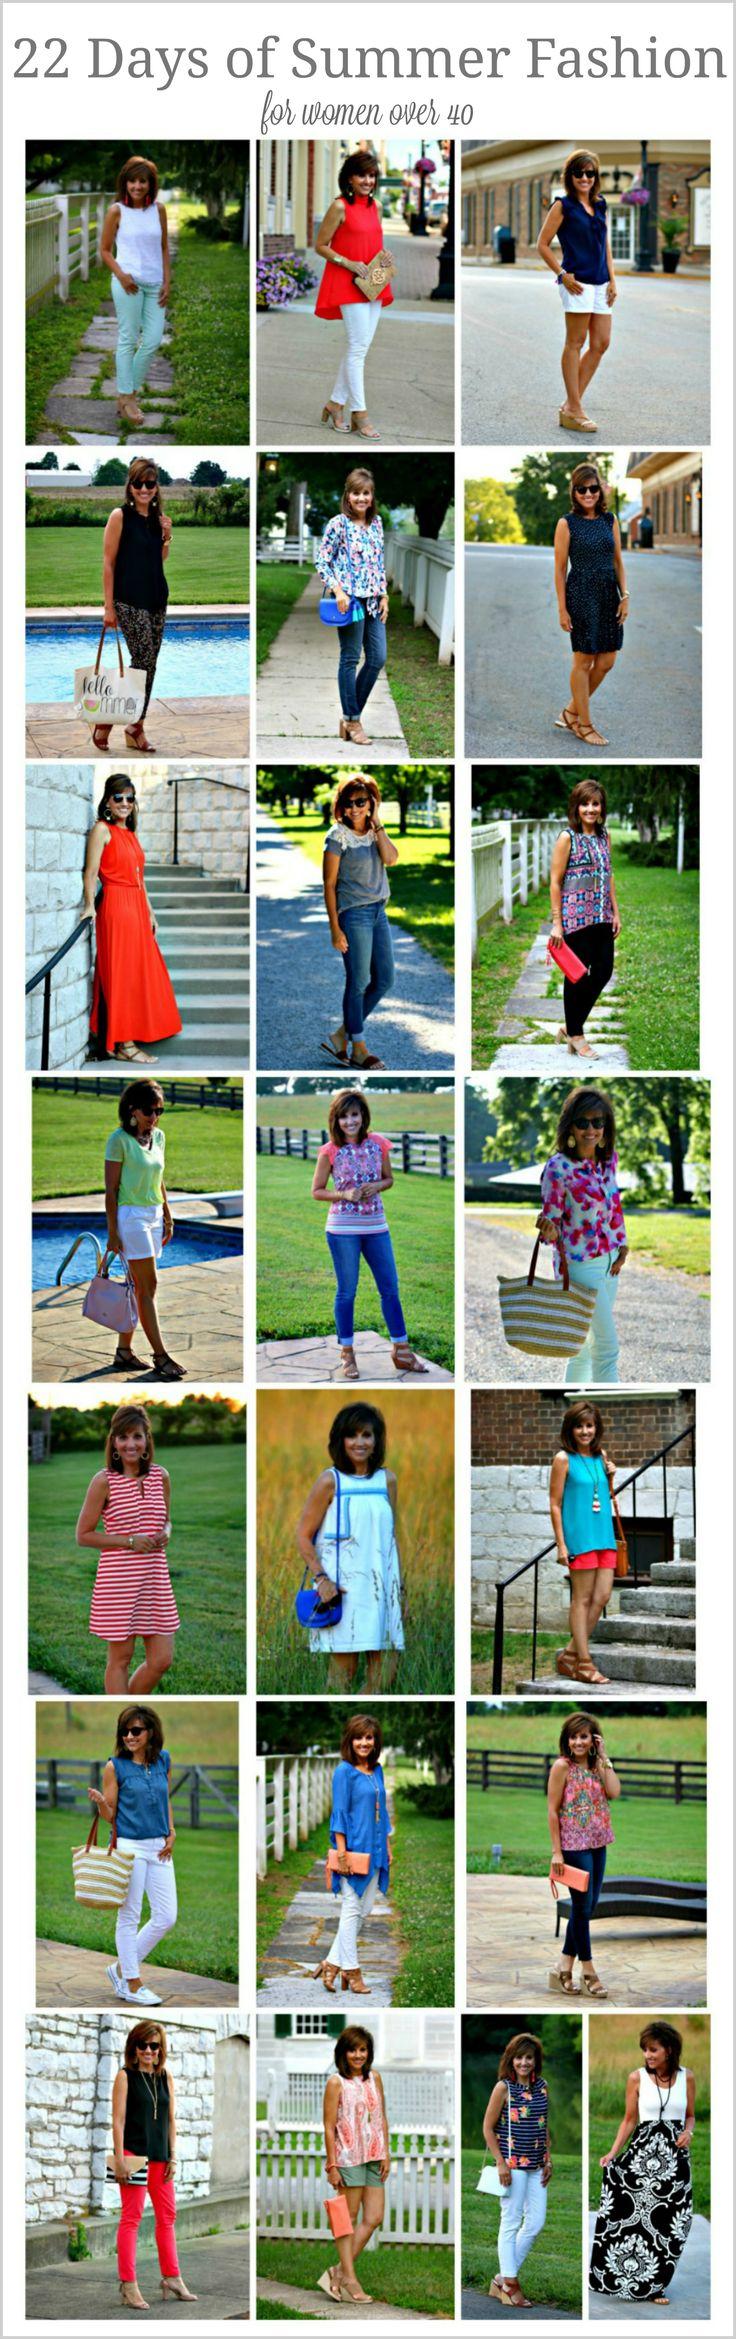 22 Days of Summer Fashion Recap - Grace & Beauty